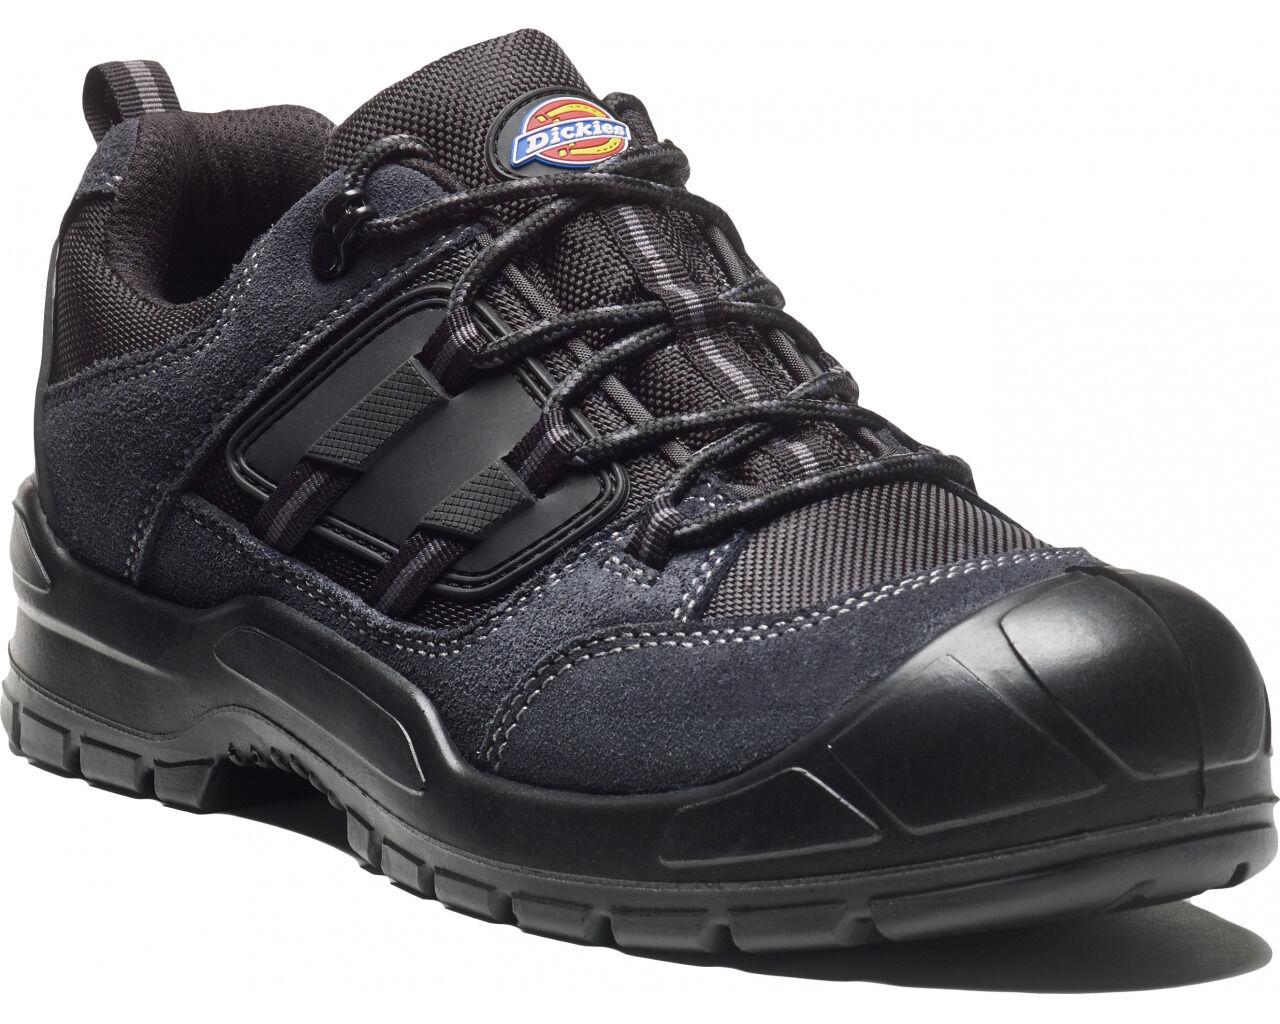 Dickies cotidiano Zapatos de seguridad puntera acero para hombre anti anti anti Scuff 3f6905